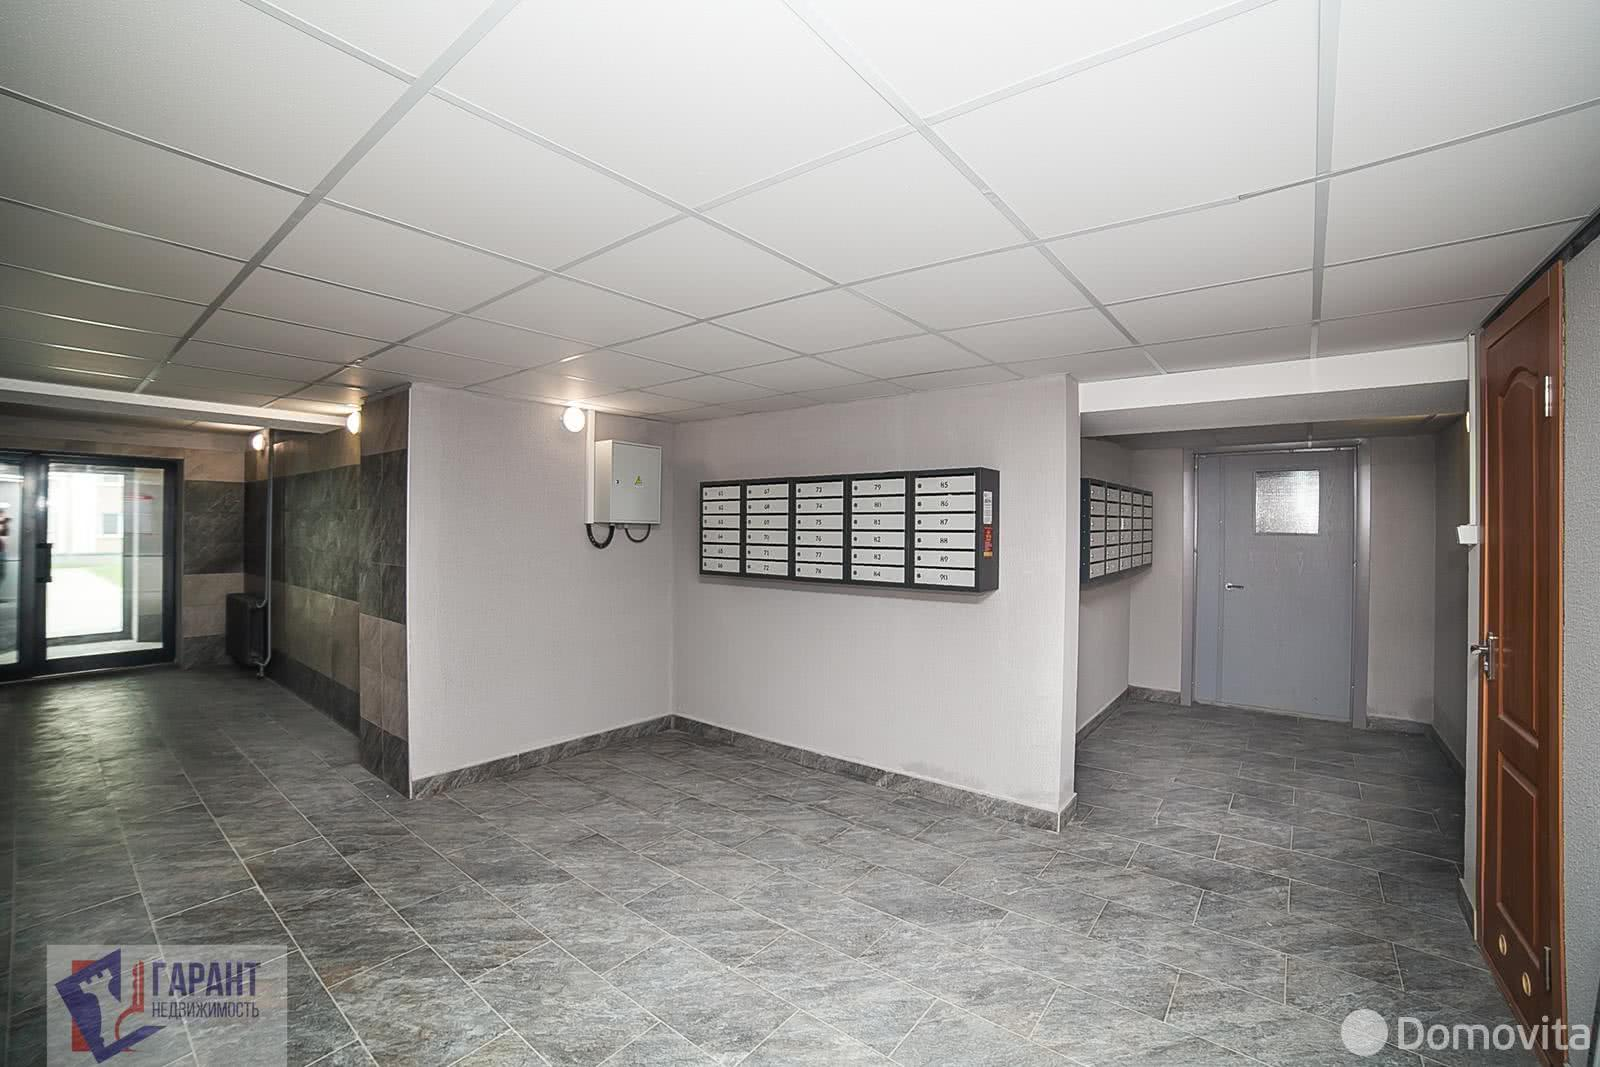 Купить 1-комнатную квартиру в Минске, пер. Зубачева 3-й, д. 5 - фото 5